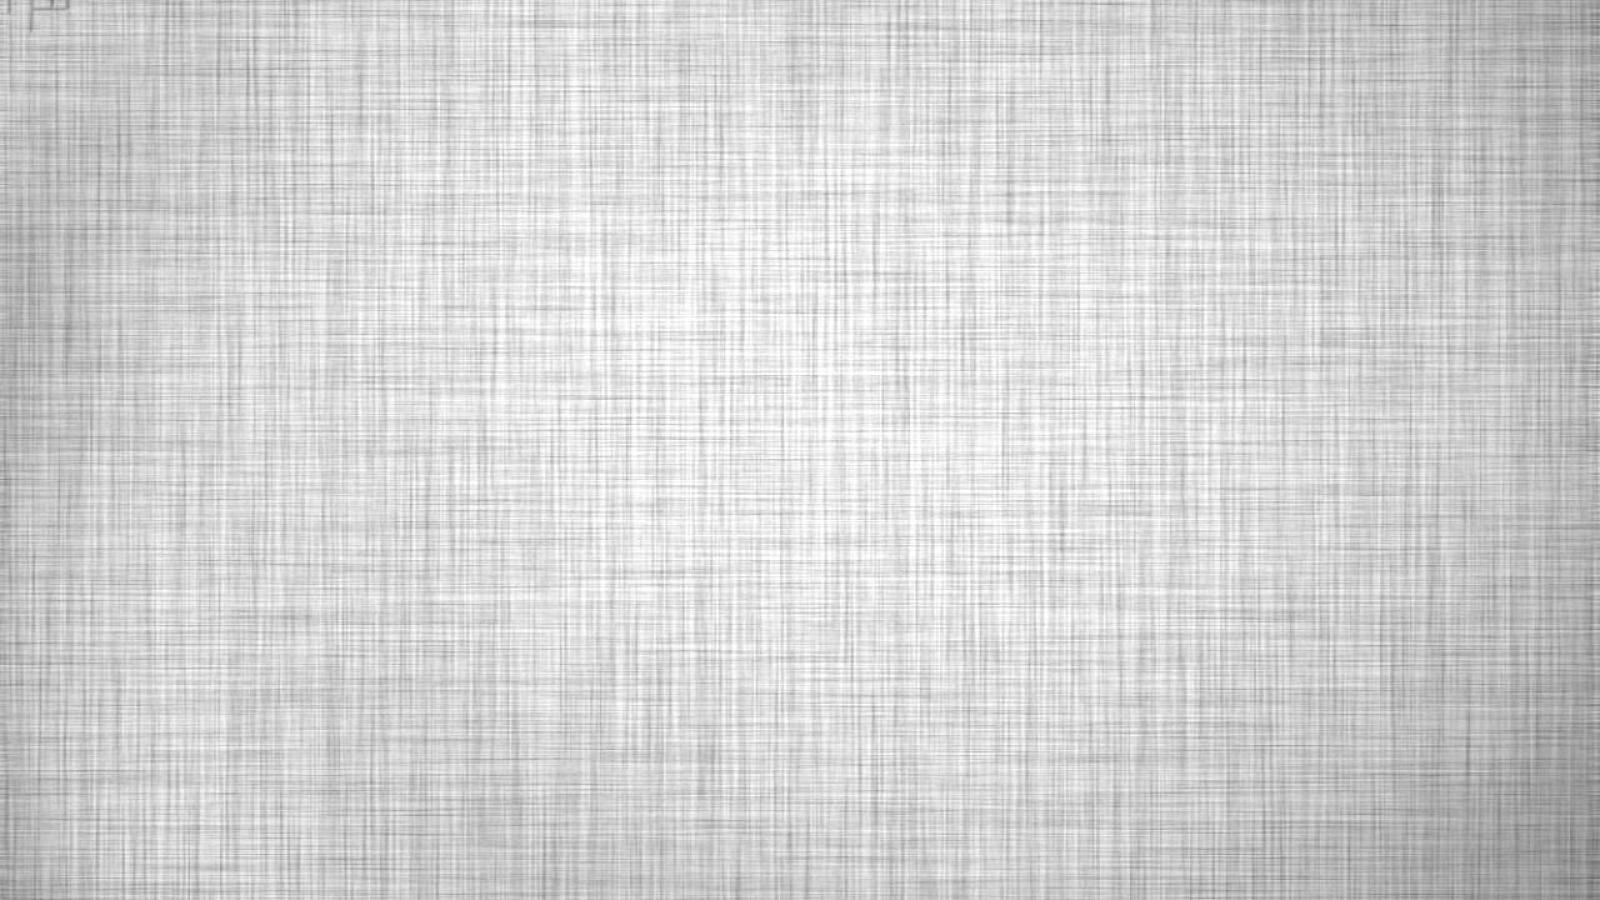 Plain white background wallpaper hd 2017 live wallpaper hd for Plain background images for photoshop